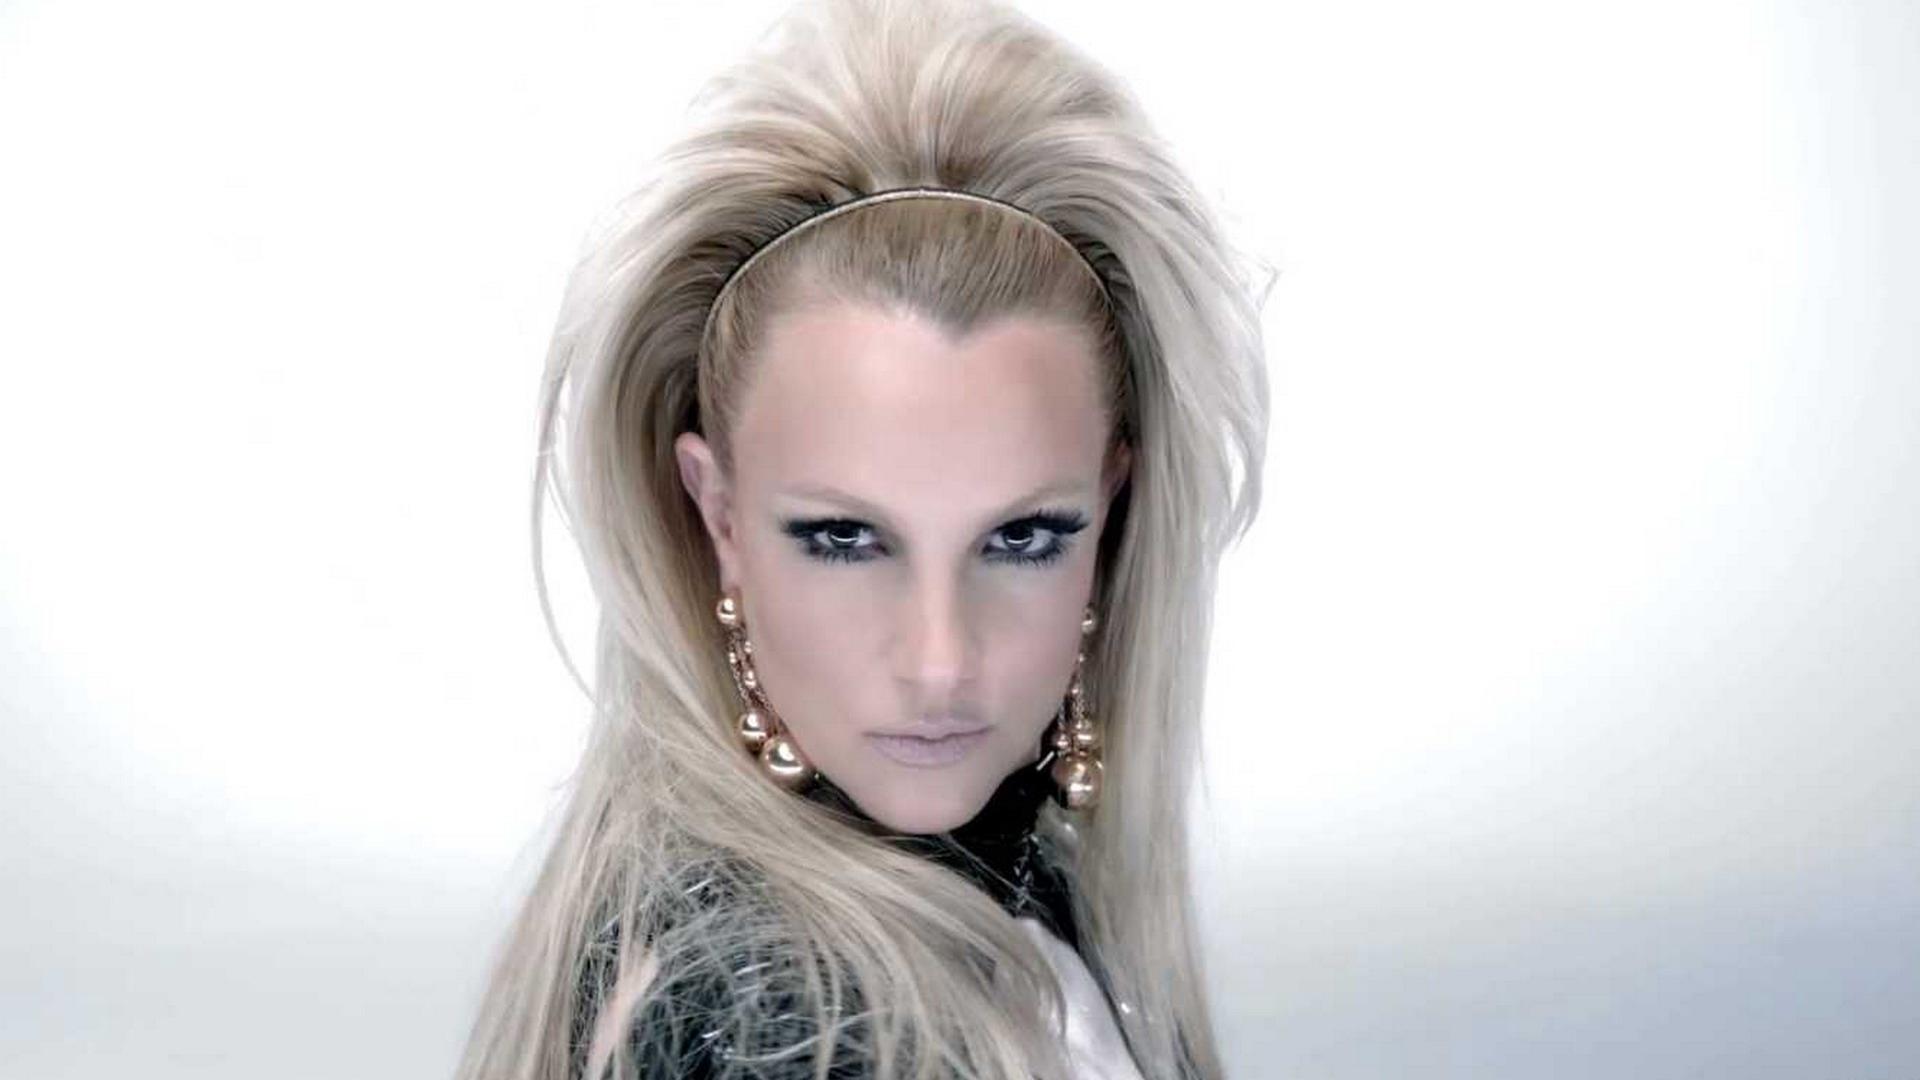 Britney Spears Widescreen